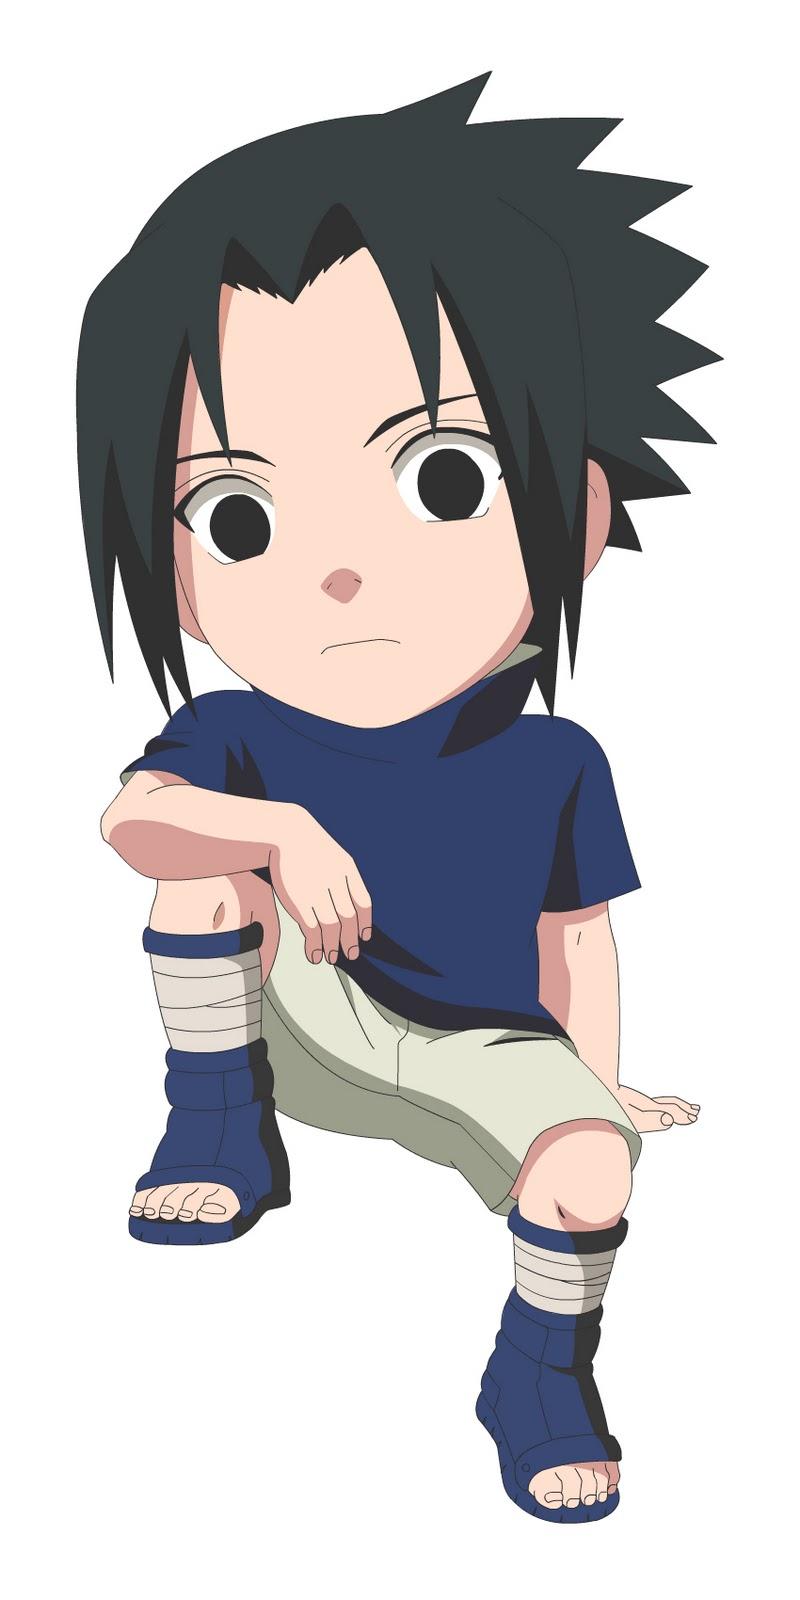 Artbook naruto shippuden animes online - Naruto chibi images ...